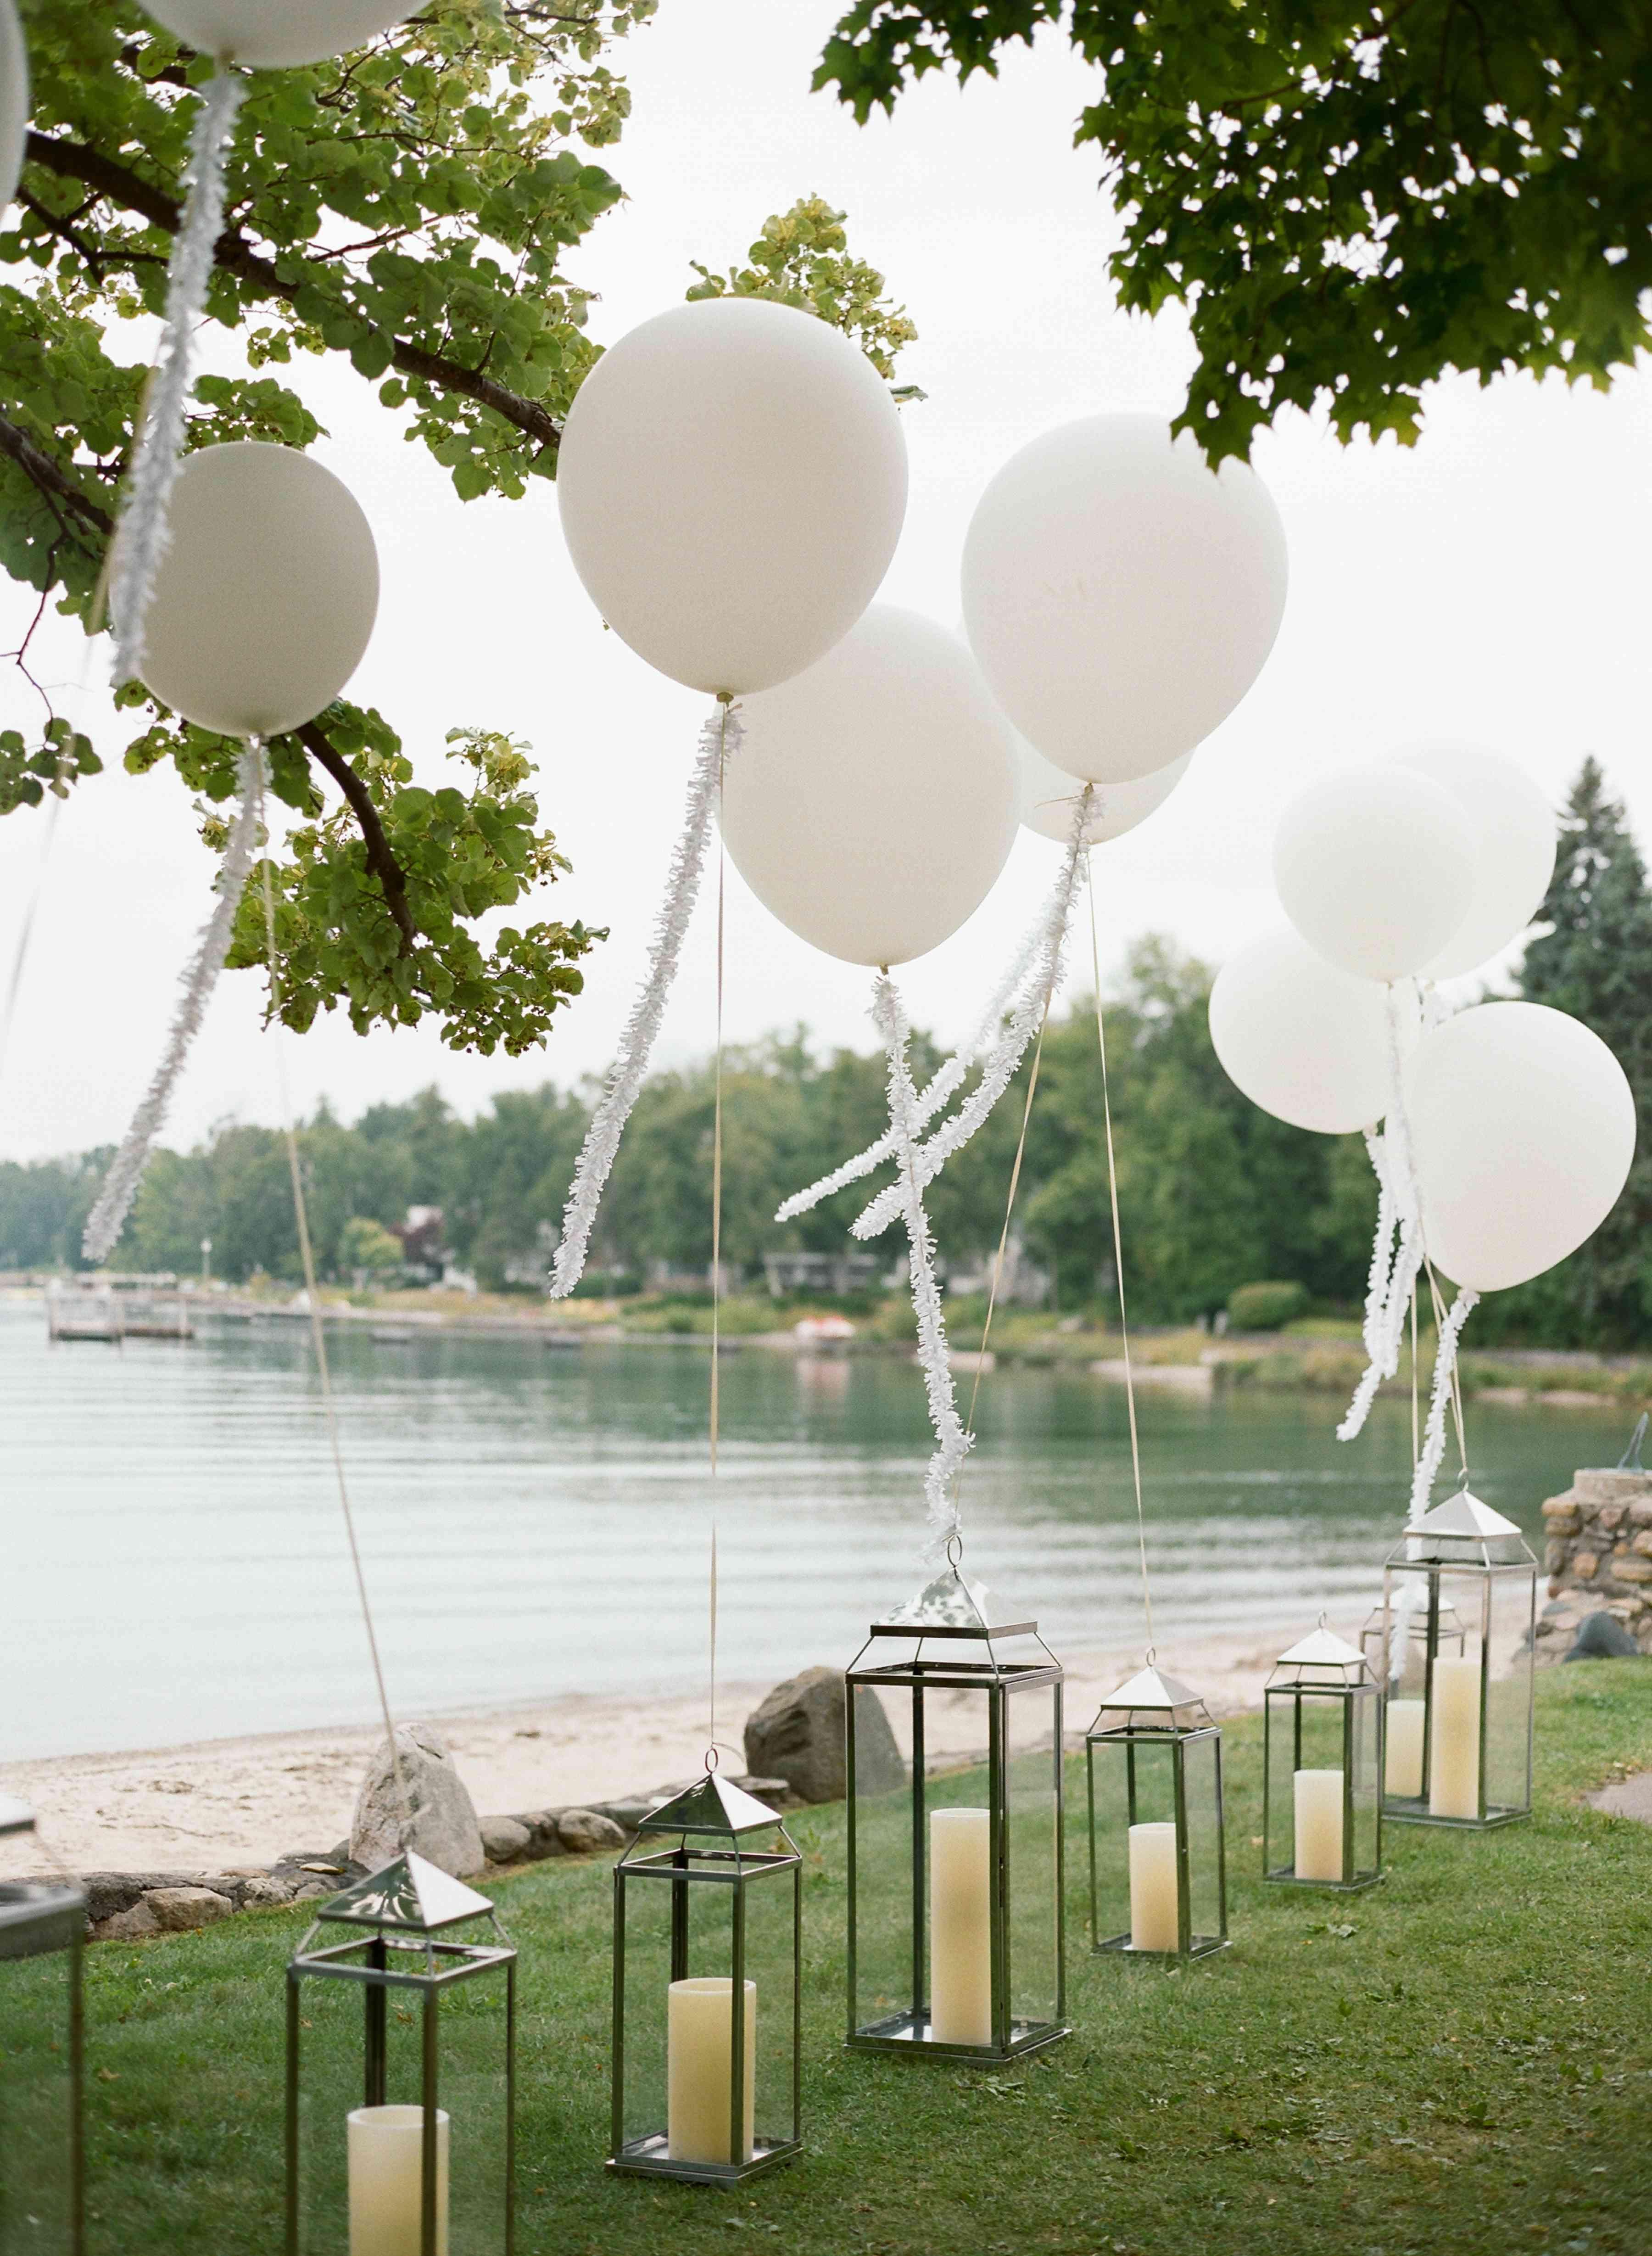 White balloons tied to lanterns beside a lake